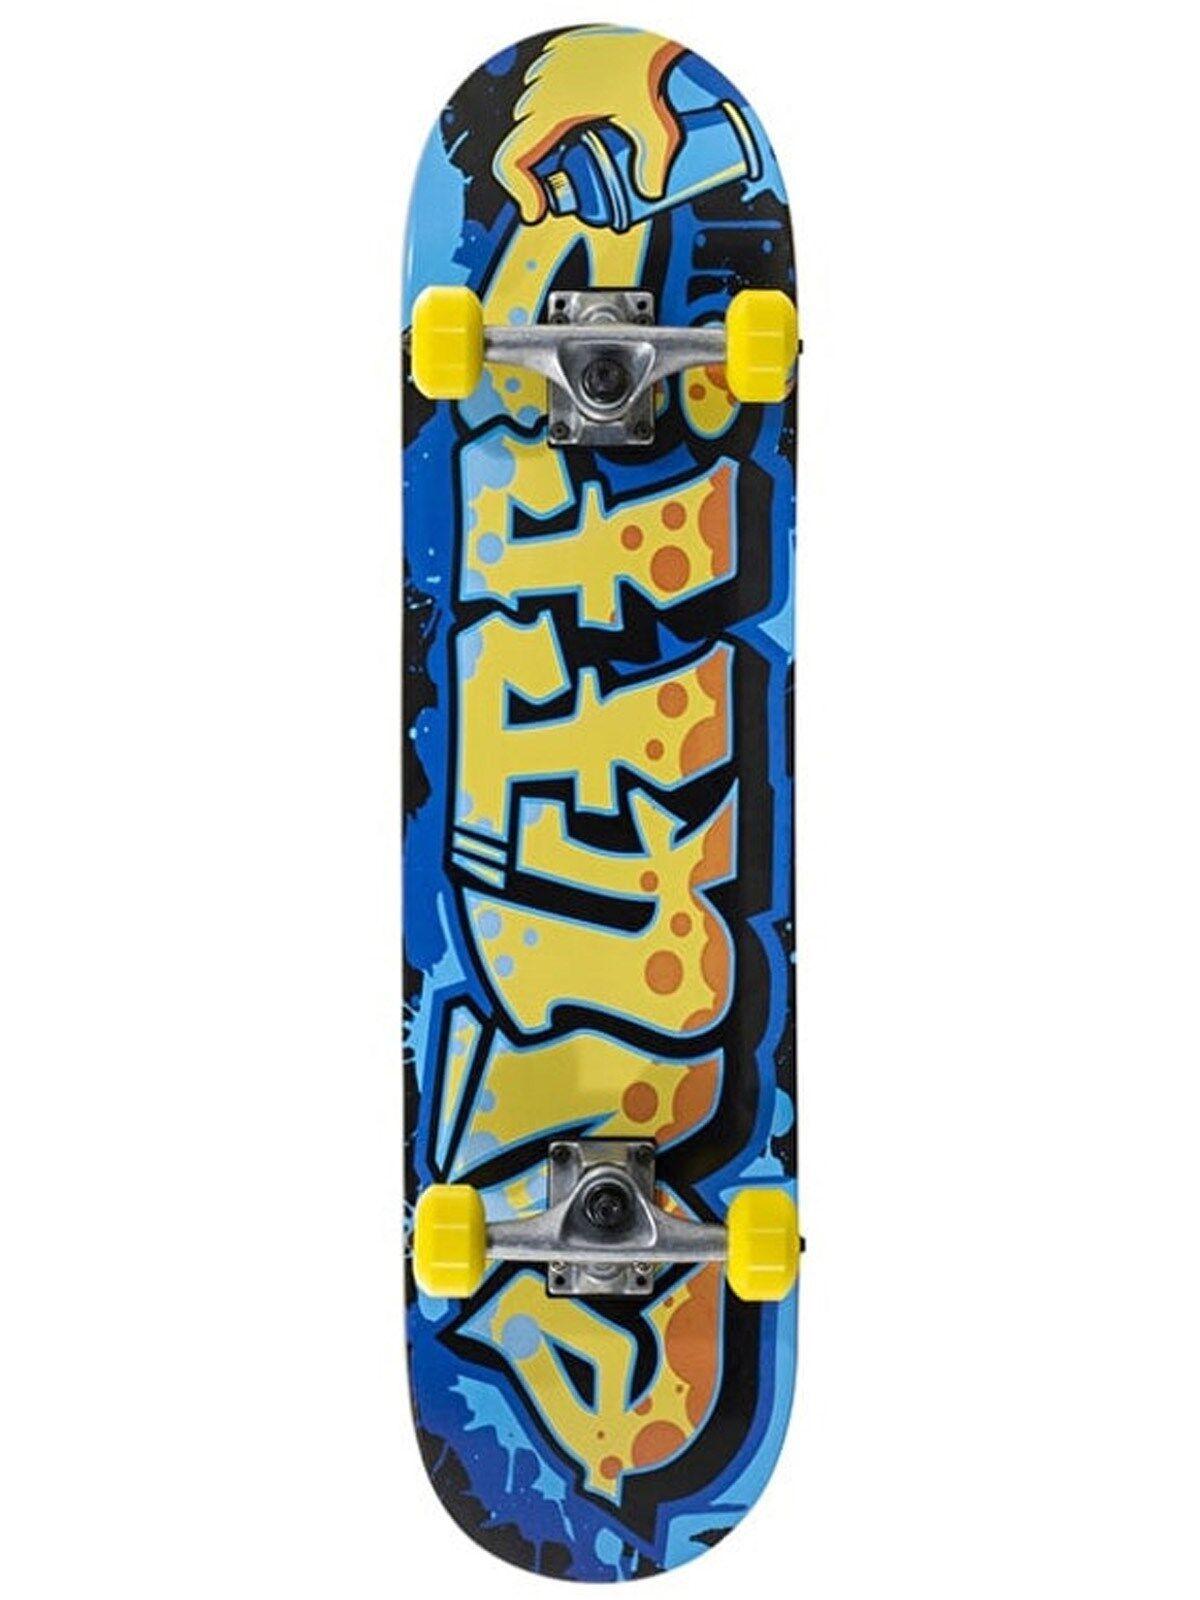 Enuff Graffiti giallo II - 7.25 Pollici Skateboard Kids Skateboard Pollici completo 3912b1